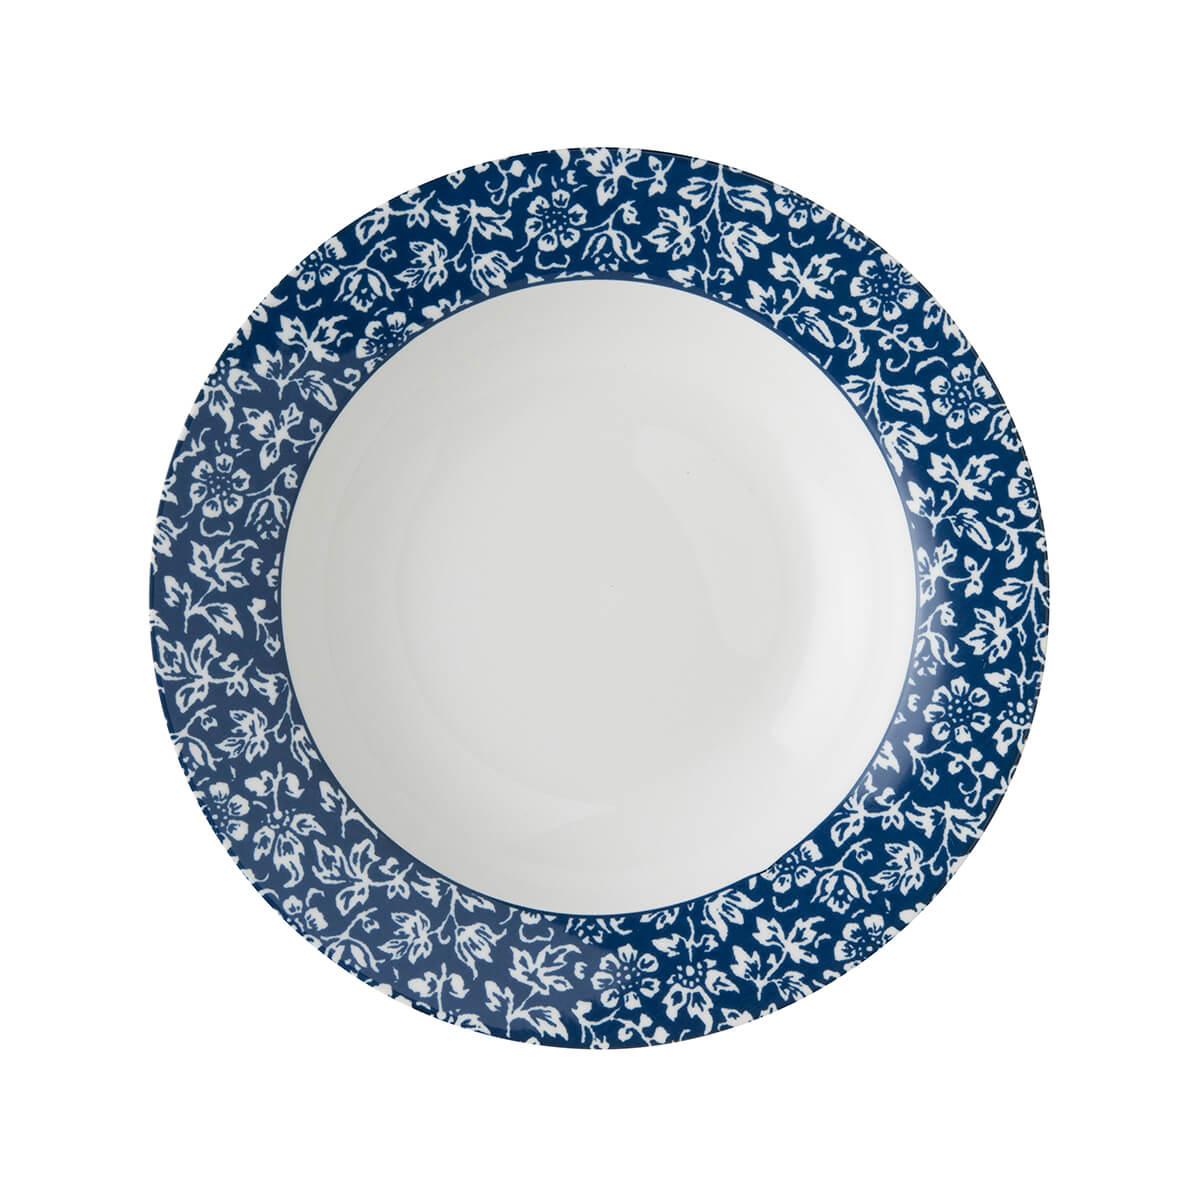 Онлайн каталог PROMENU: Тарелка глубокая фарфоровая Laura Ashley BLUEPRINT, 22 см, синий в мелкий цветок                               178268